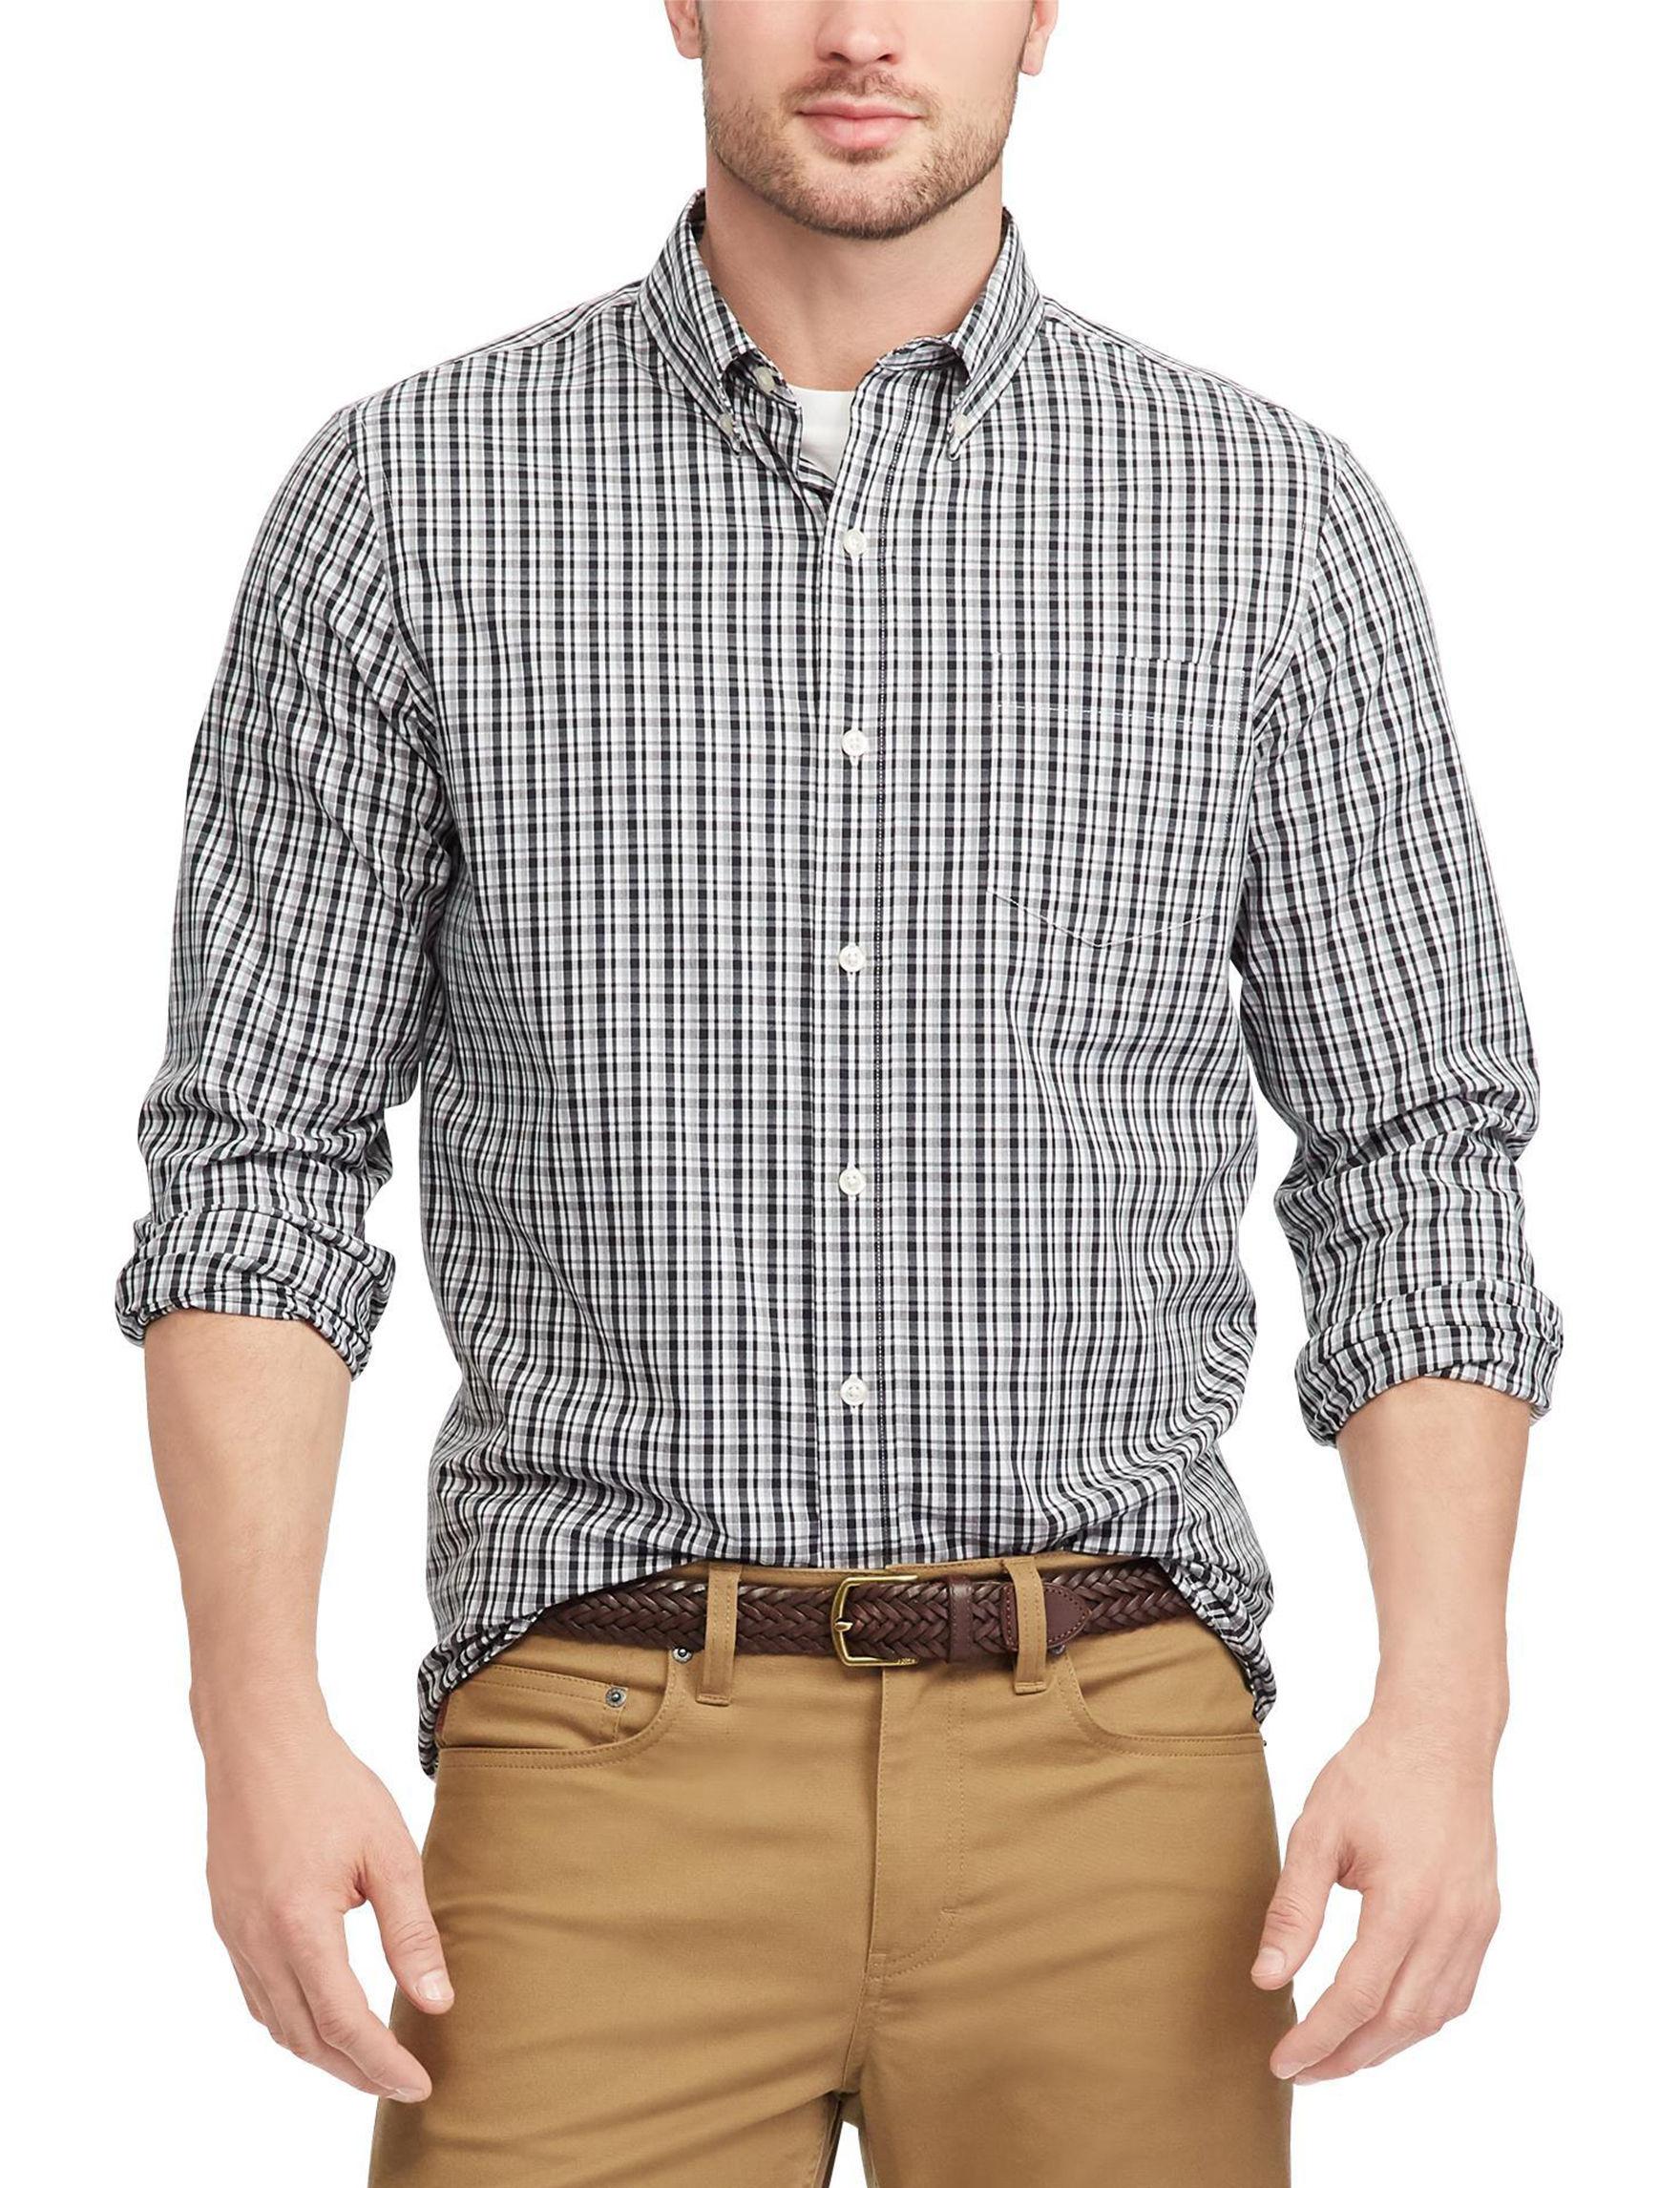 Chaps White / Black Casual Button Down Shirts